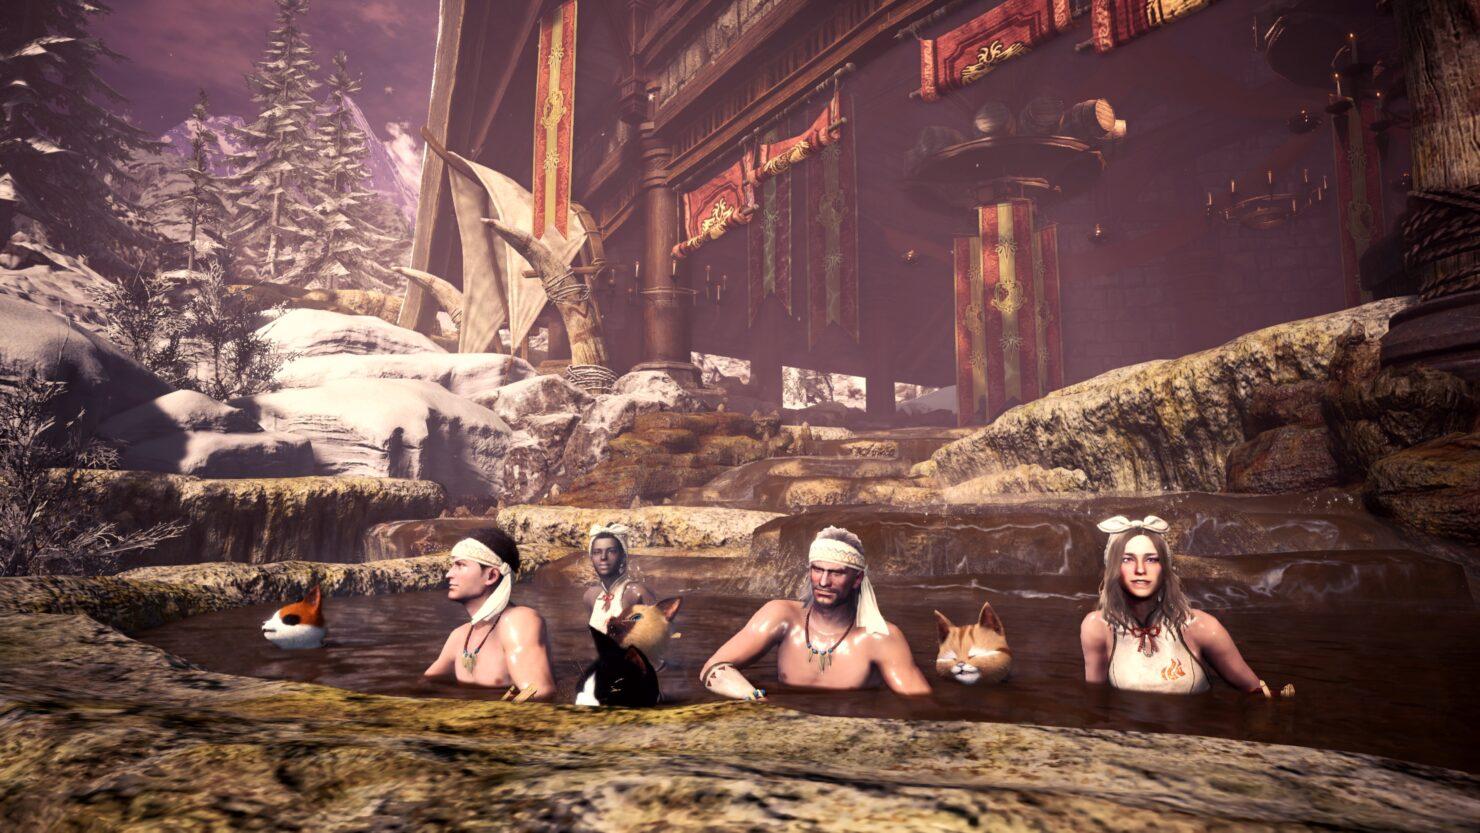 seliana_gathering_hub_-_hot_springs01_1562748104